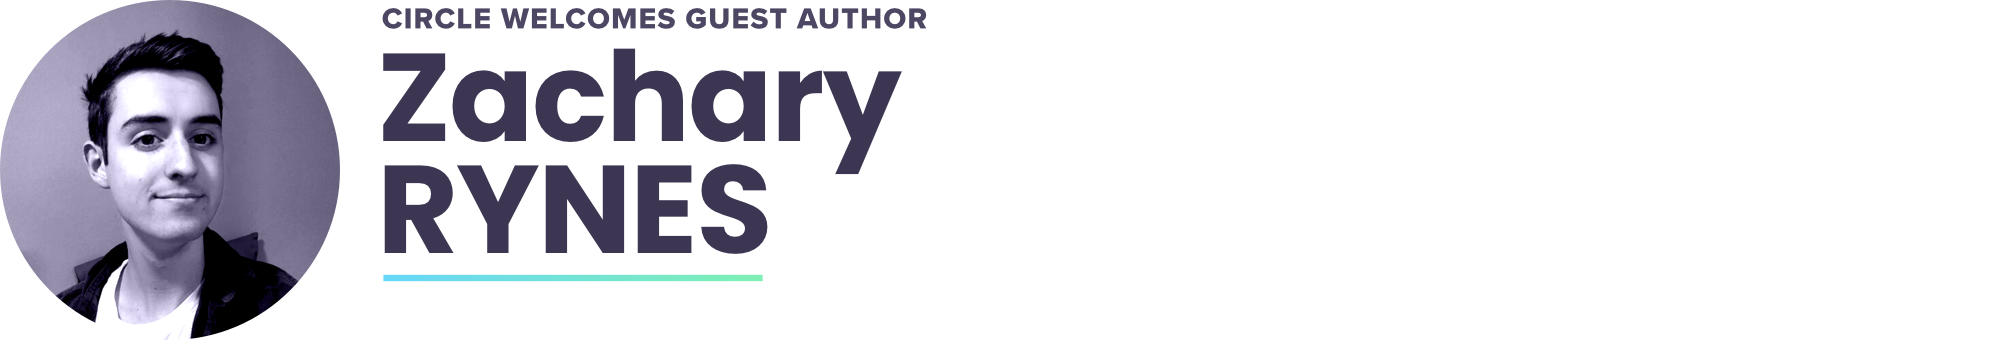 guest-author-rynes